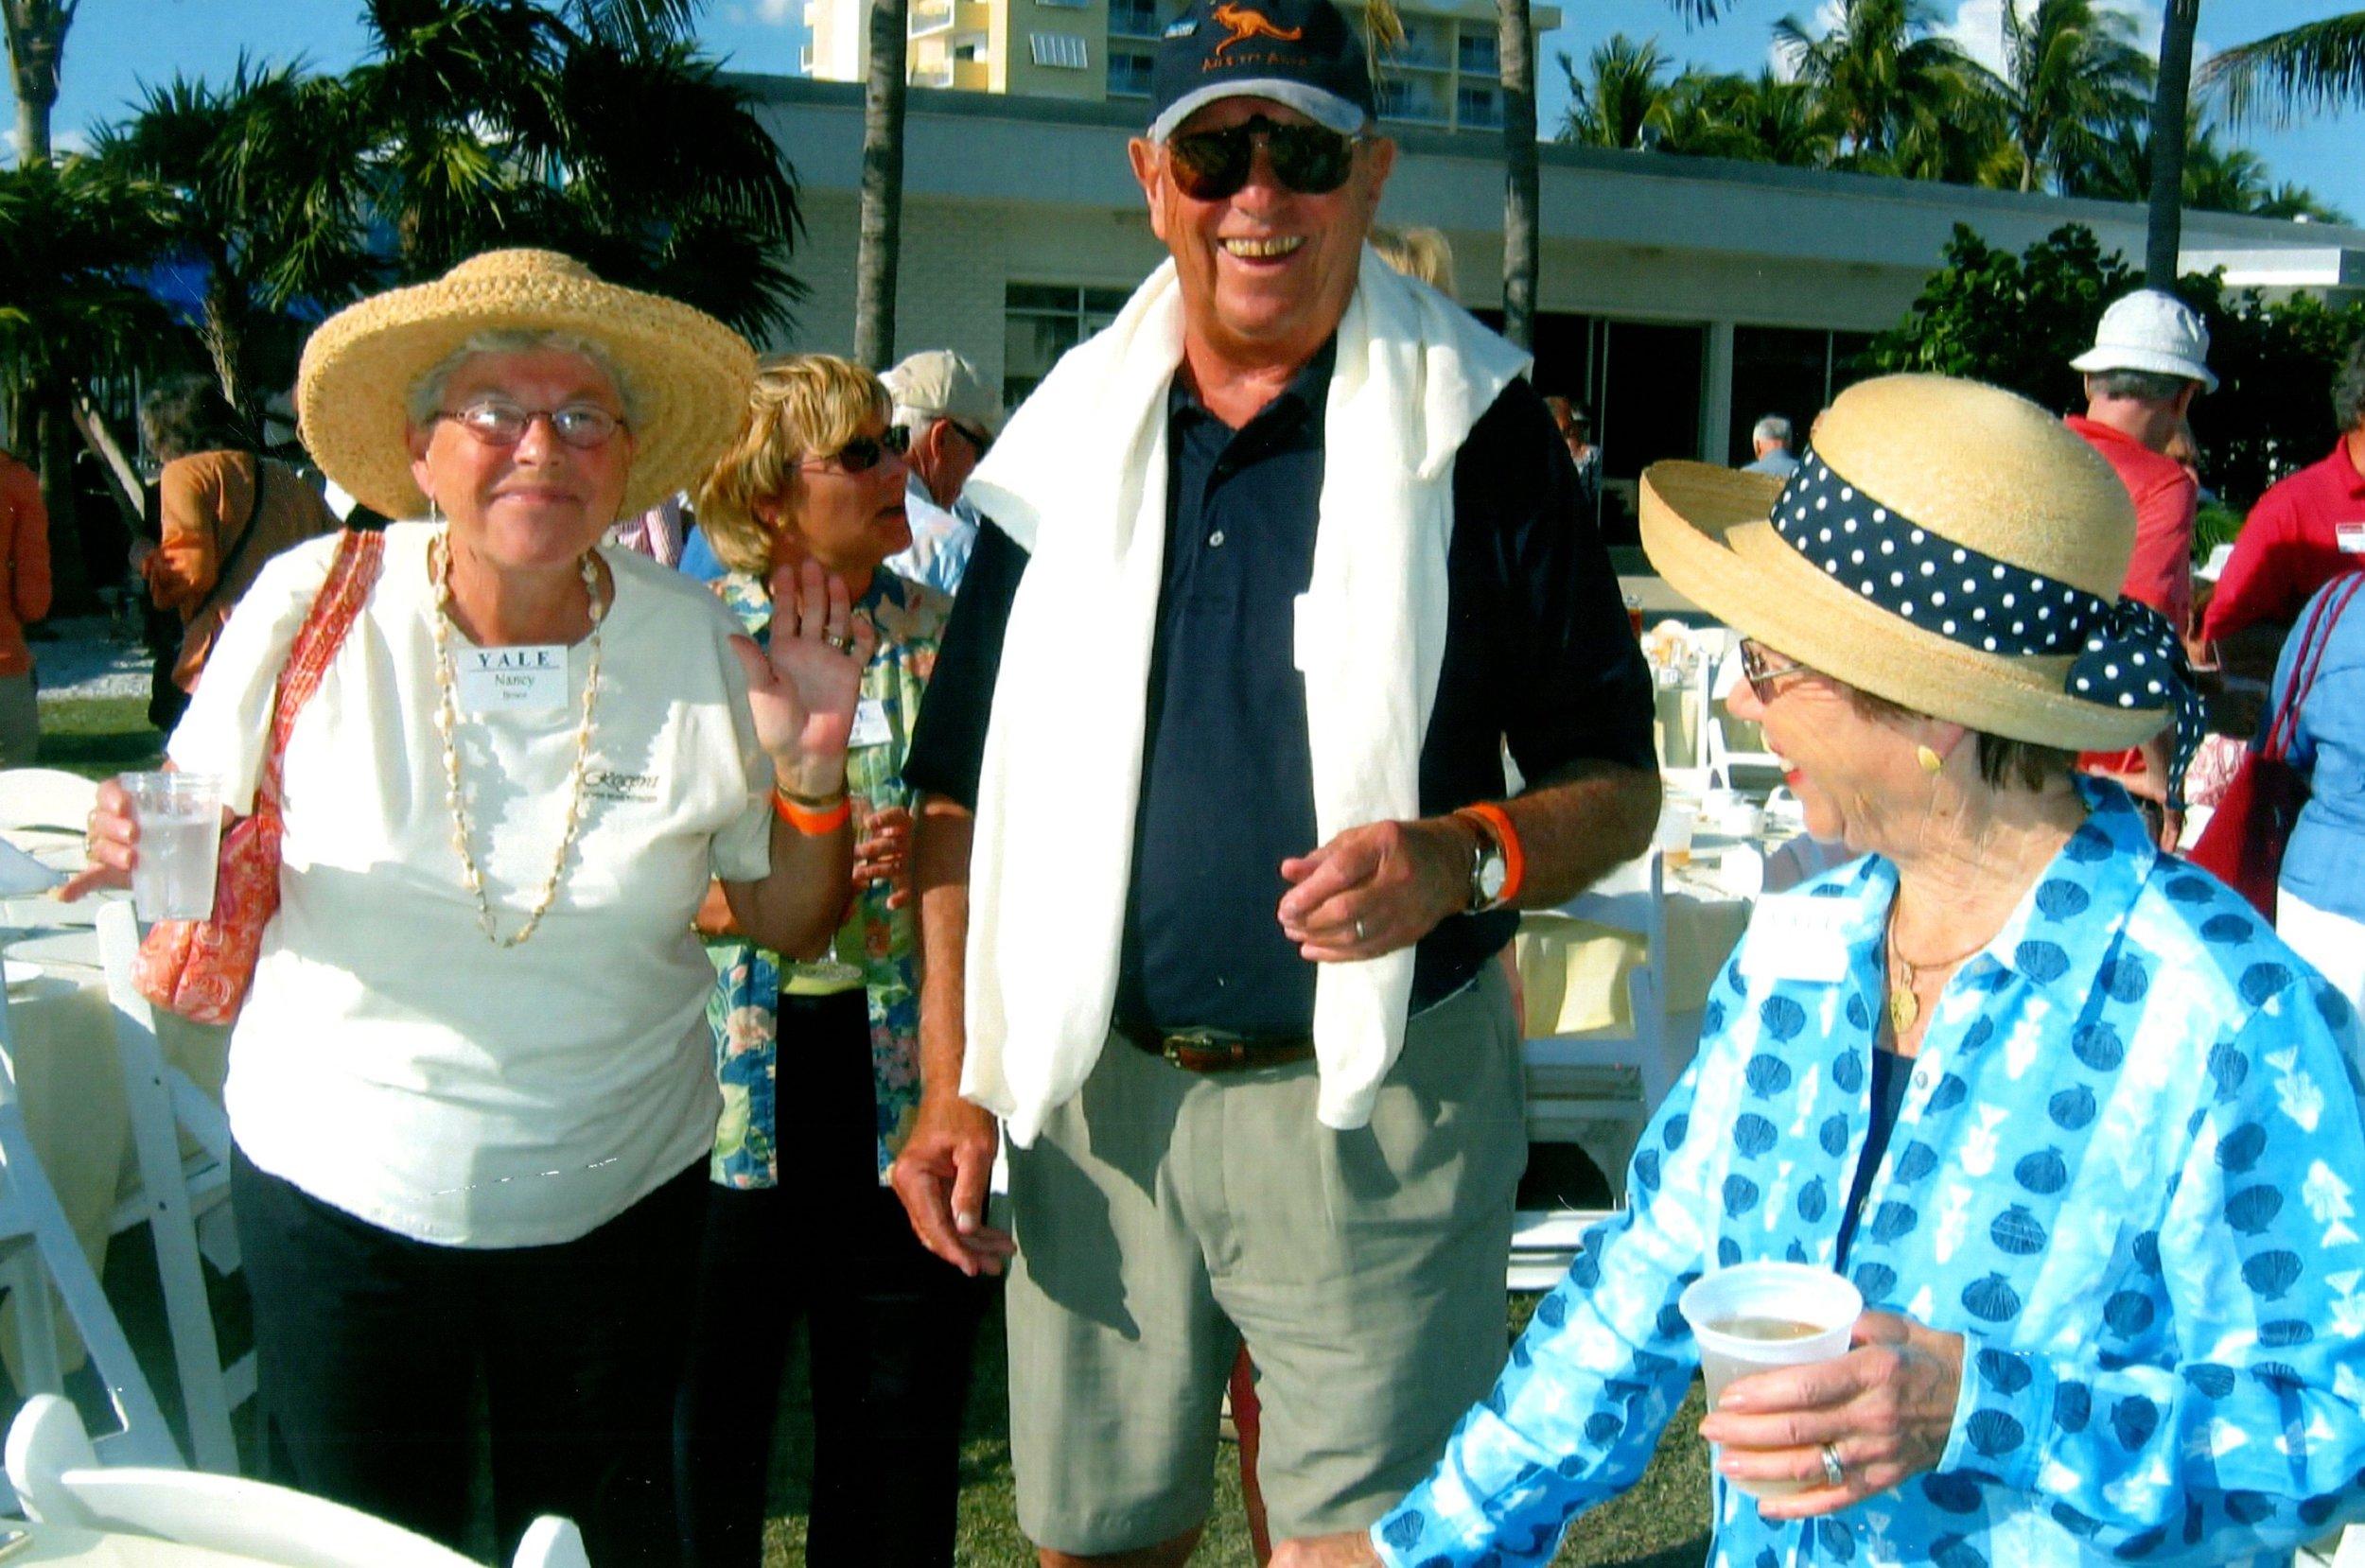 3_30_2008 - IVY LEAGUE PICNIC - NAPLES BEACH HOTEL 13.jpg